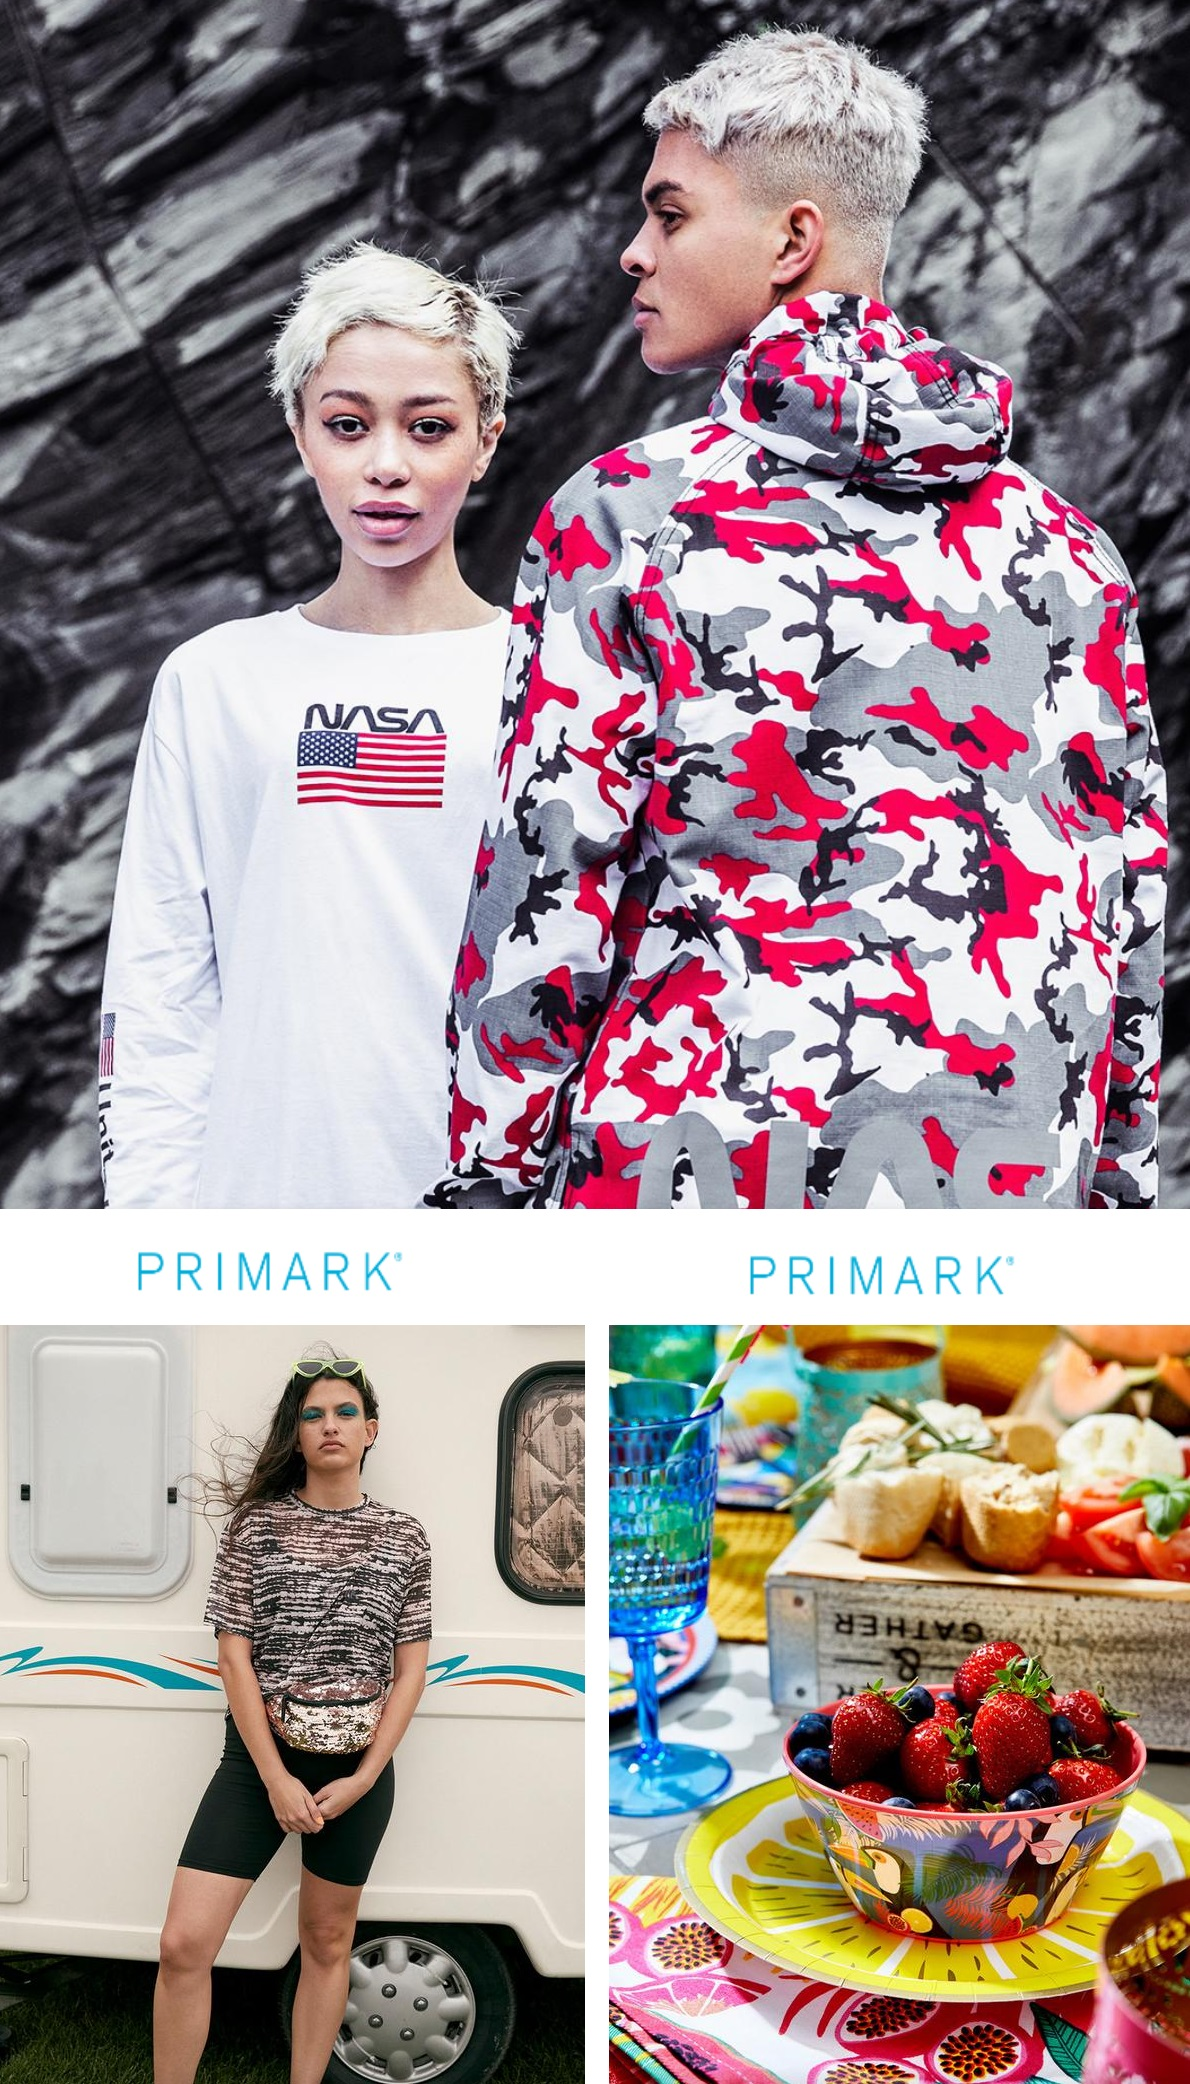 Primark Folder - 13.07-19.07.2019